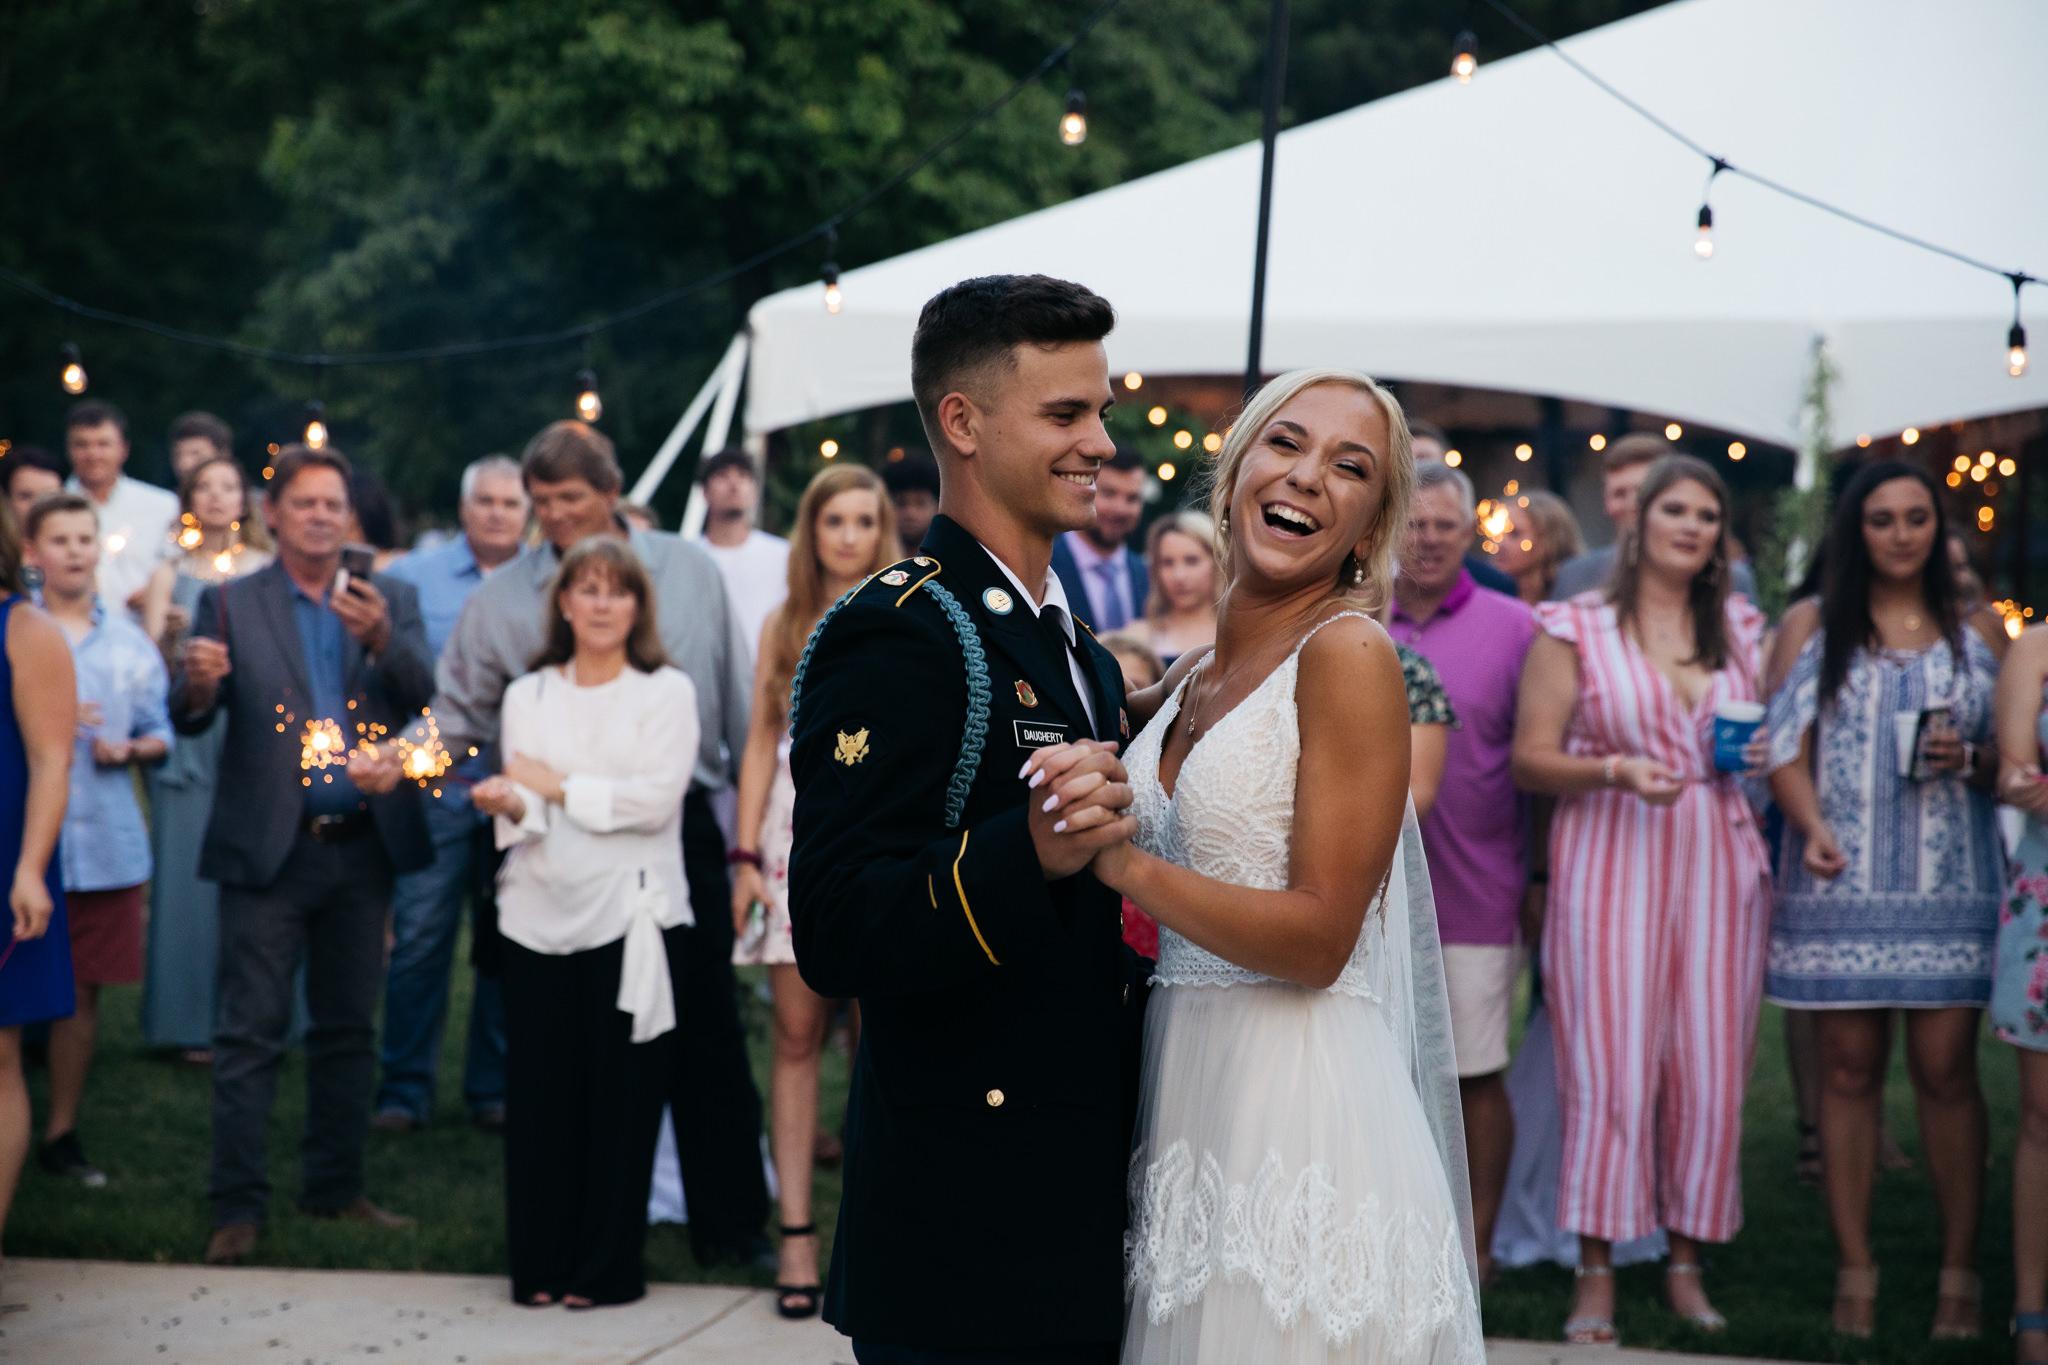 backyard-wedding-thewarmtharoundyou-lexy-branson-14.jpg